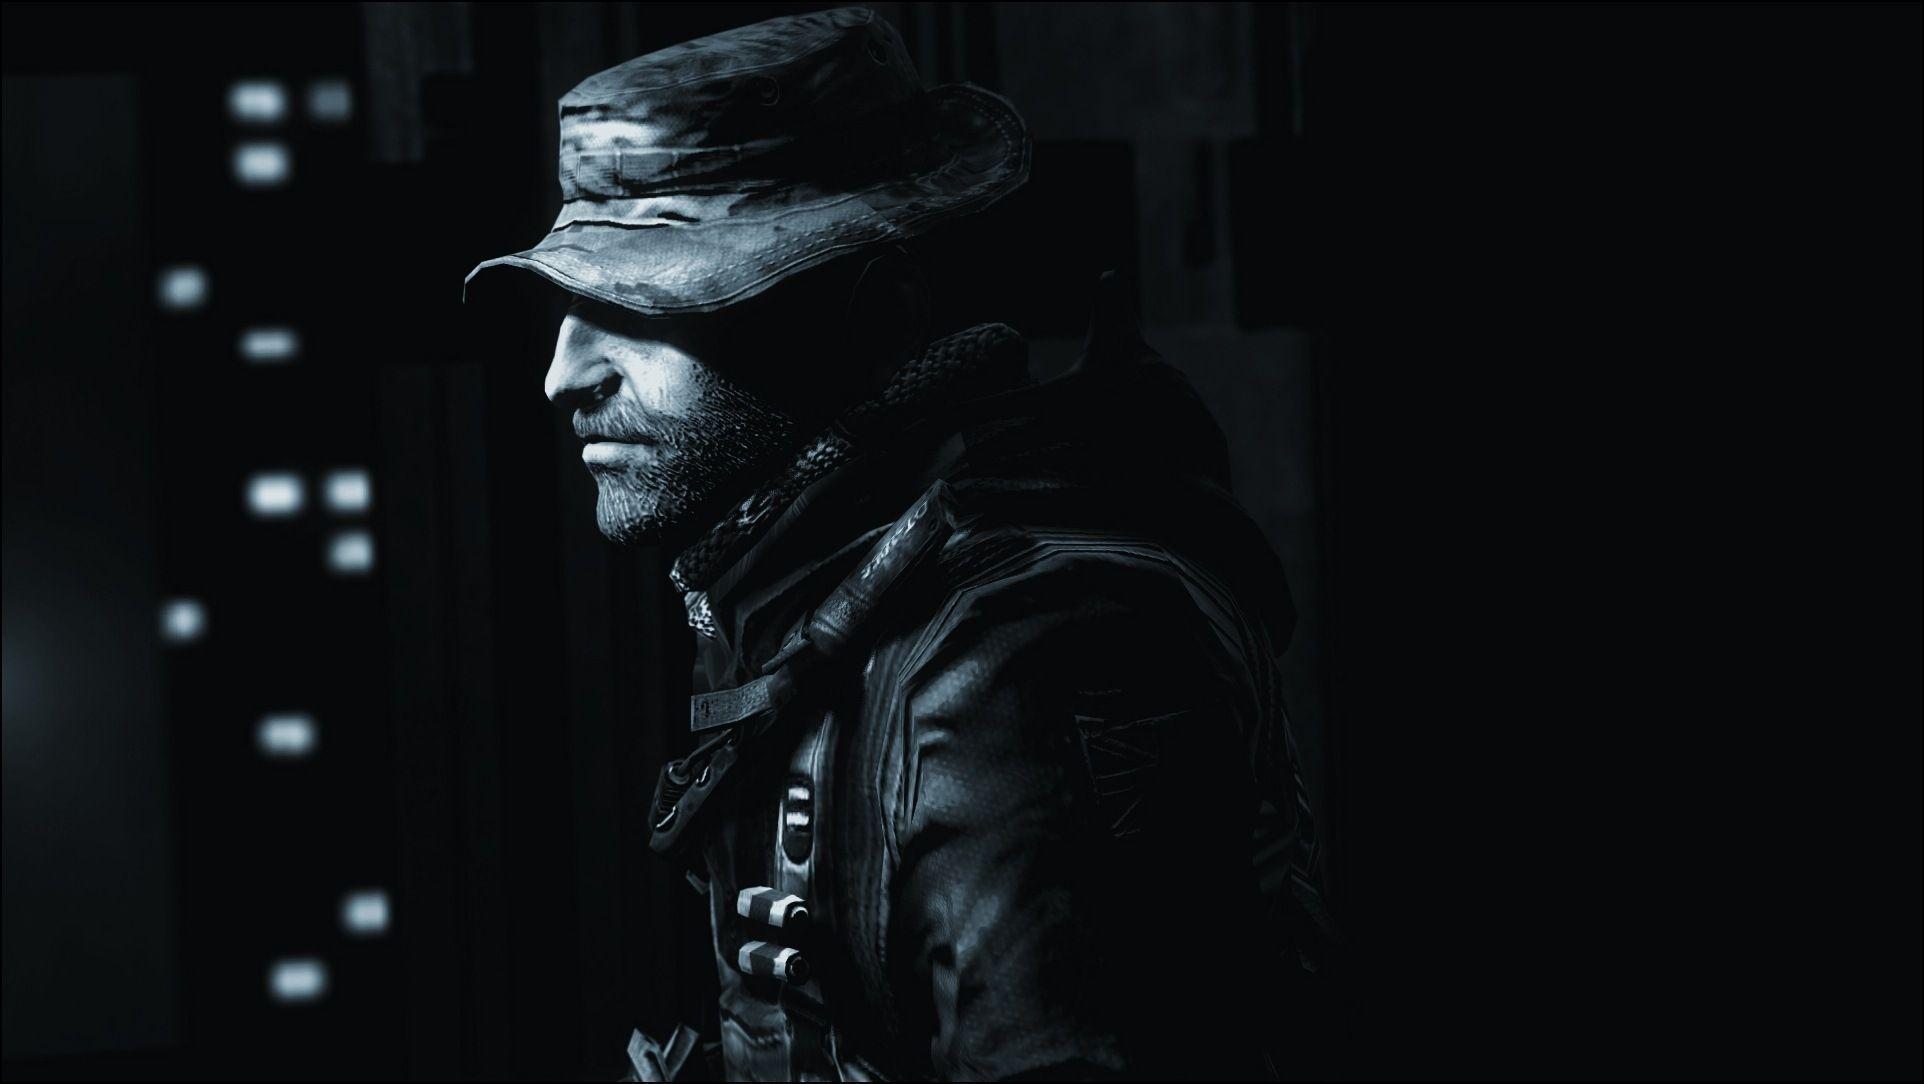 Hd Call Duty 4 Fine Call Duty 4 Wallpapers